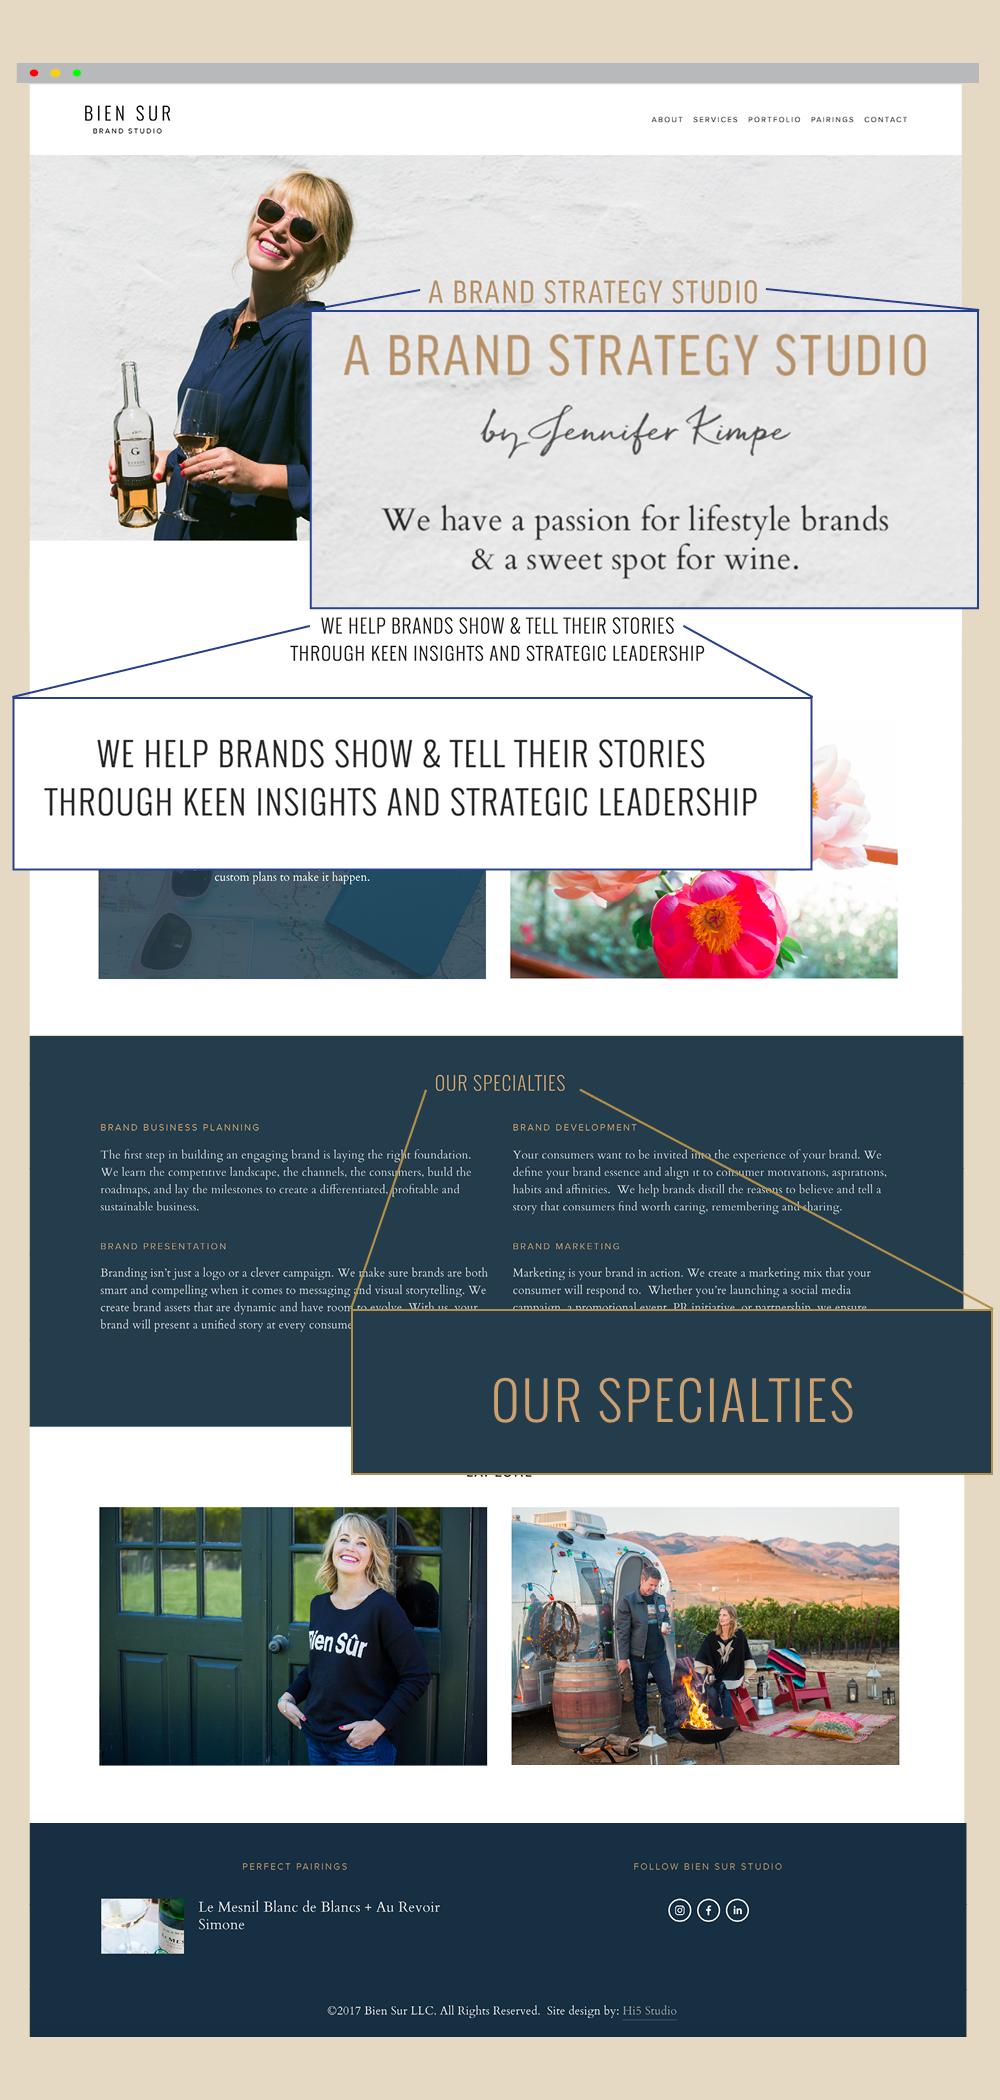 Primd Marketing - Case Study - Bien Sur Studio